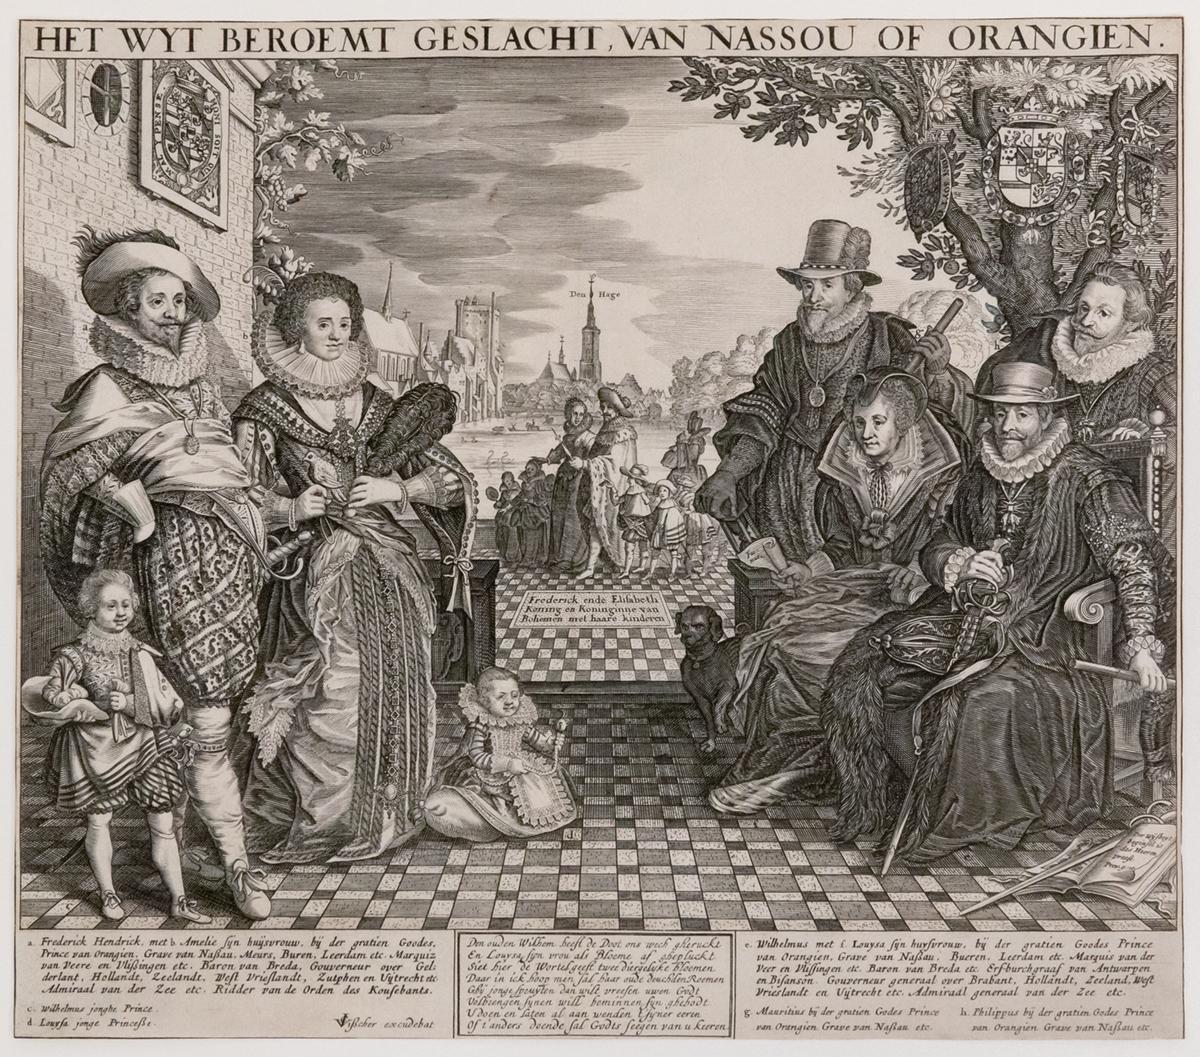 Claes Jansz Visscher (1587-1652) <em>The Far-famed House of Nassau or Orange</em>, ca. 1628-29 Krannert Art Museum, University of Illinois, Urbana-Champaign